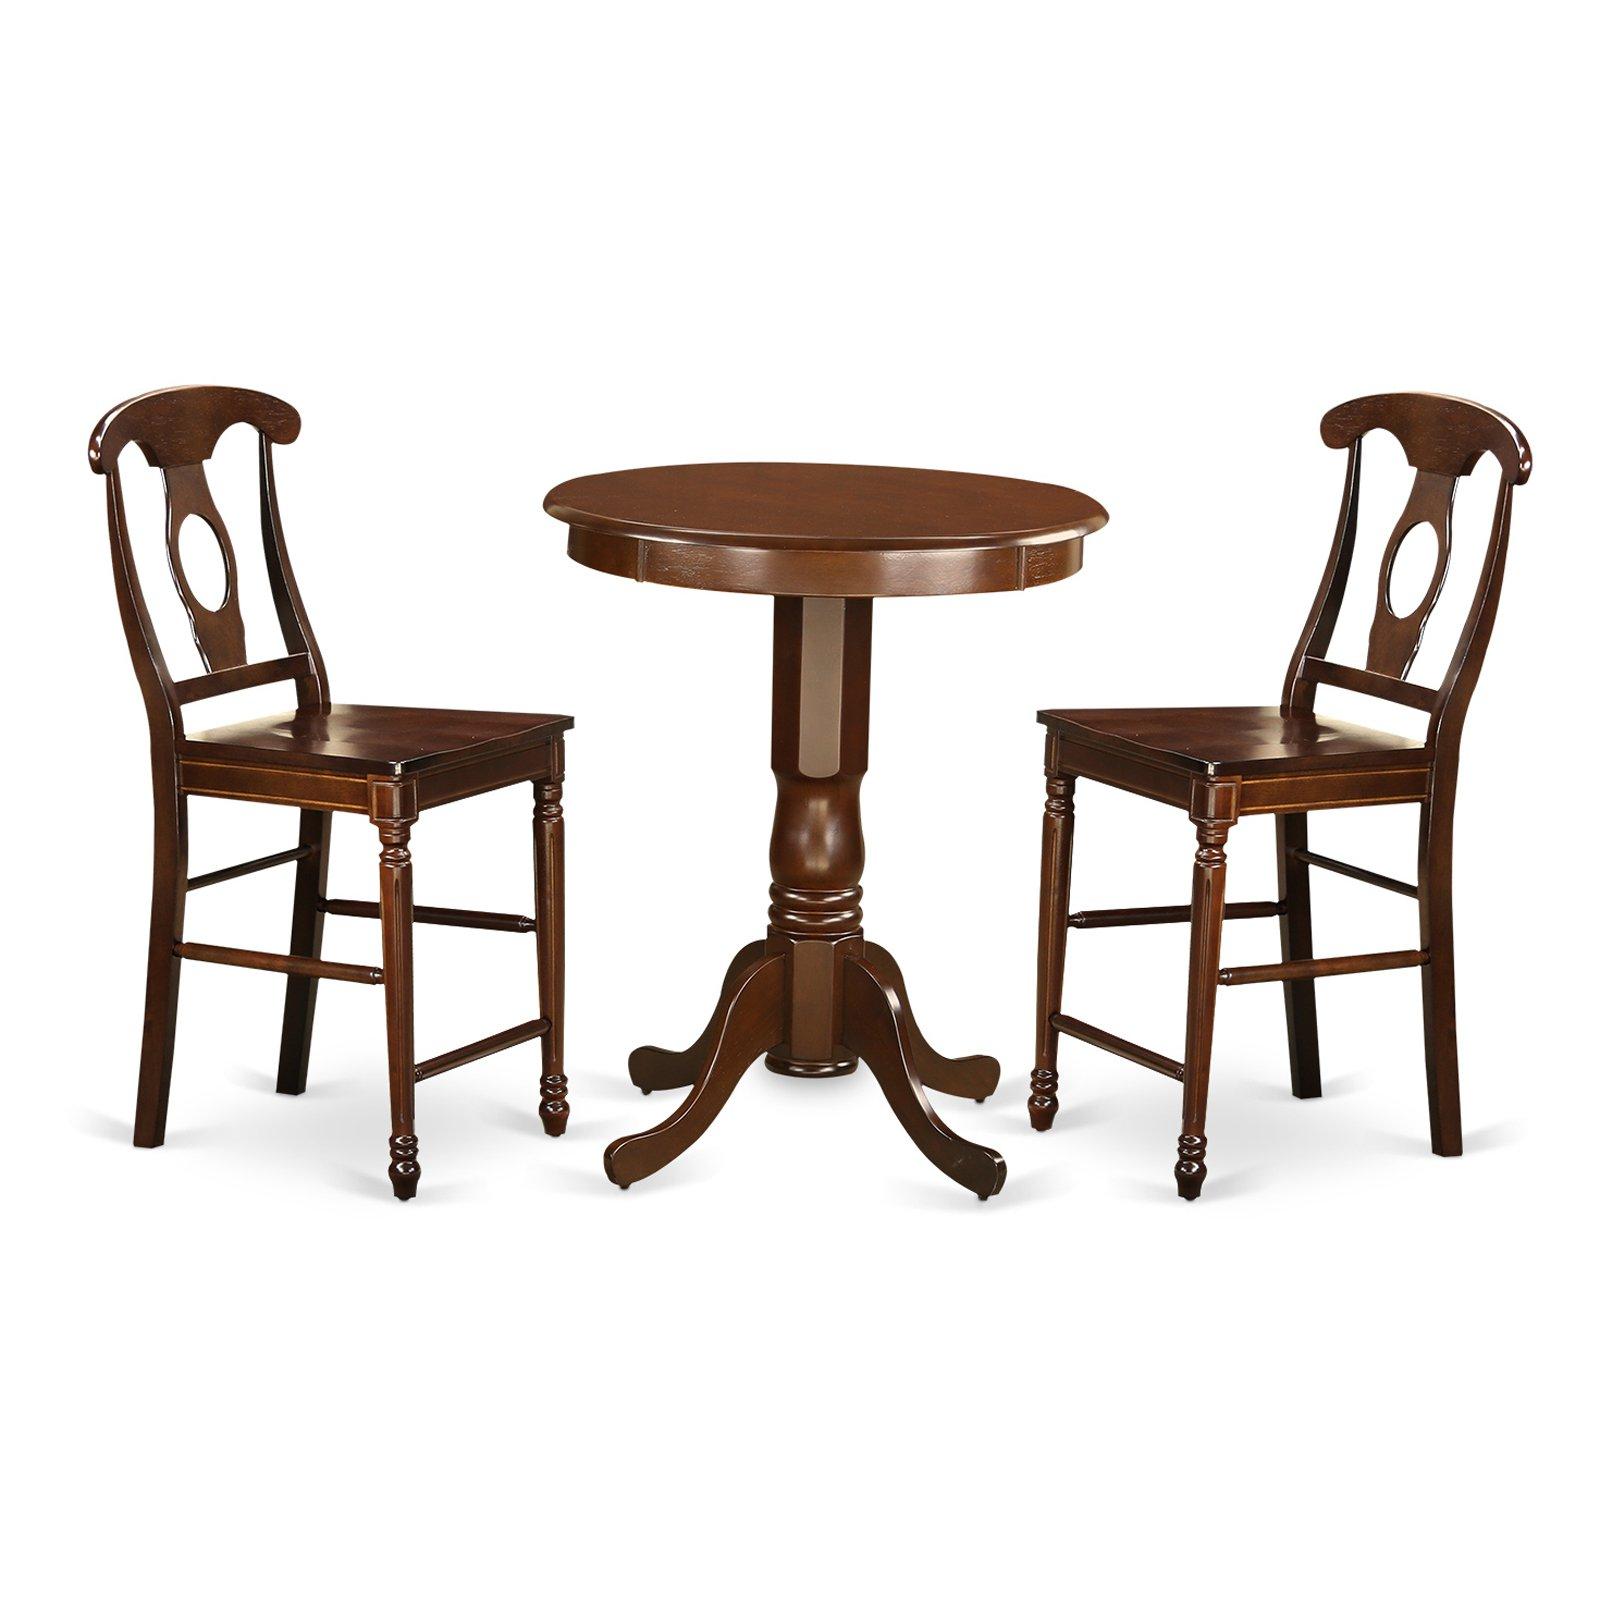 East West Furniture Eden 3 Piece Keyhole Dining Table Set